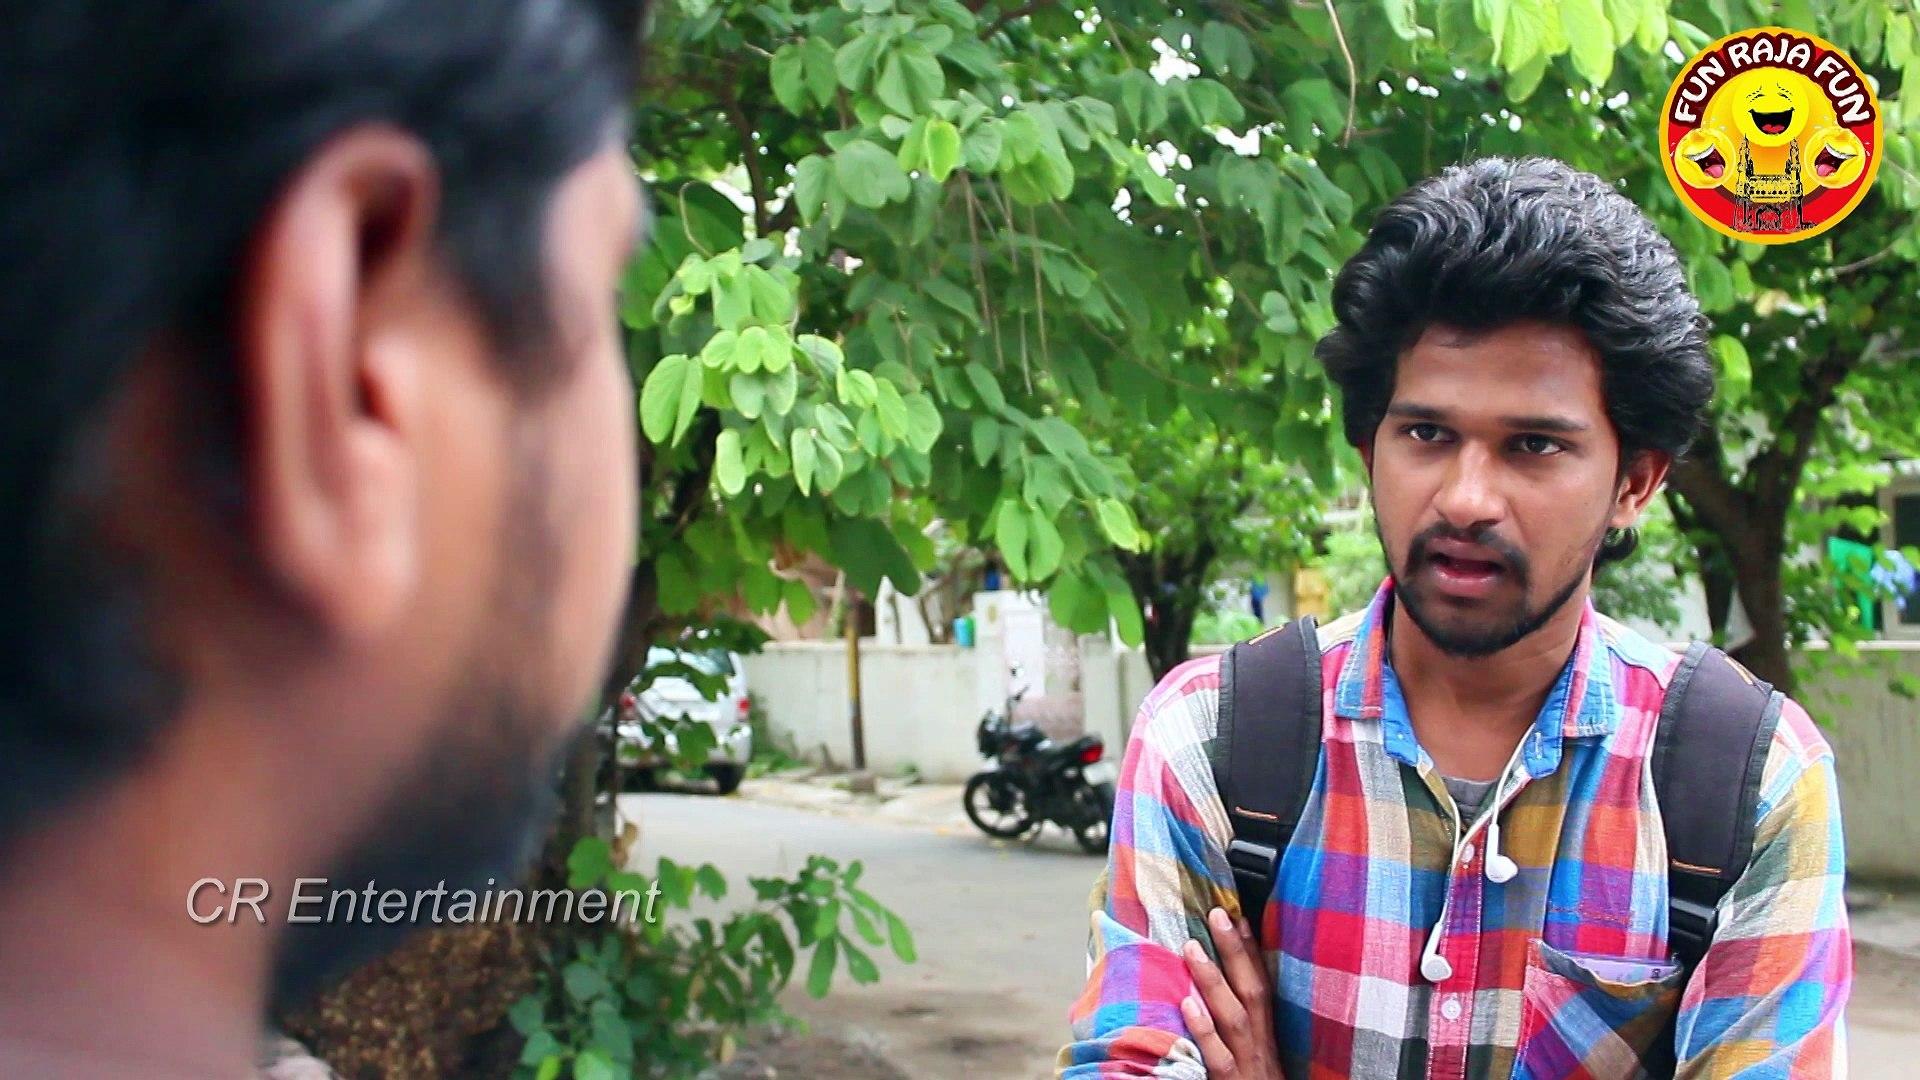 Fun Raja Fun ll Jeberdast Latest fun comedy ll Episode 8 By @ Sridhar Ambati...